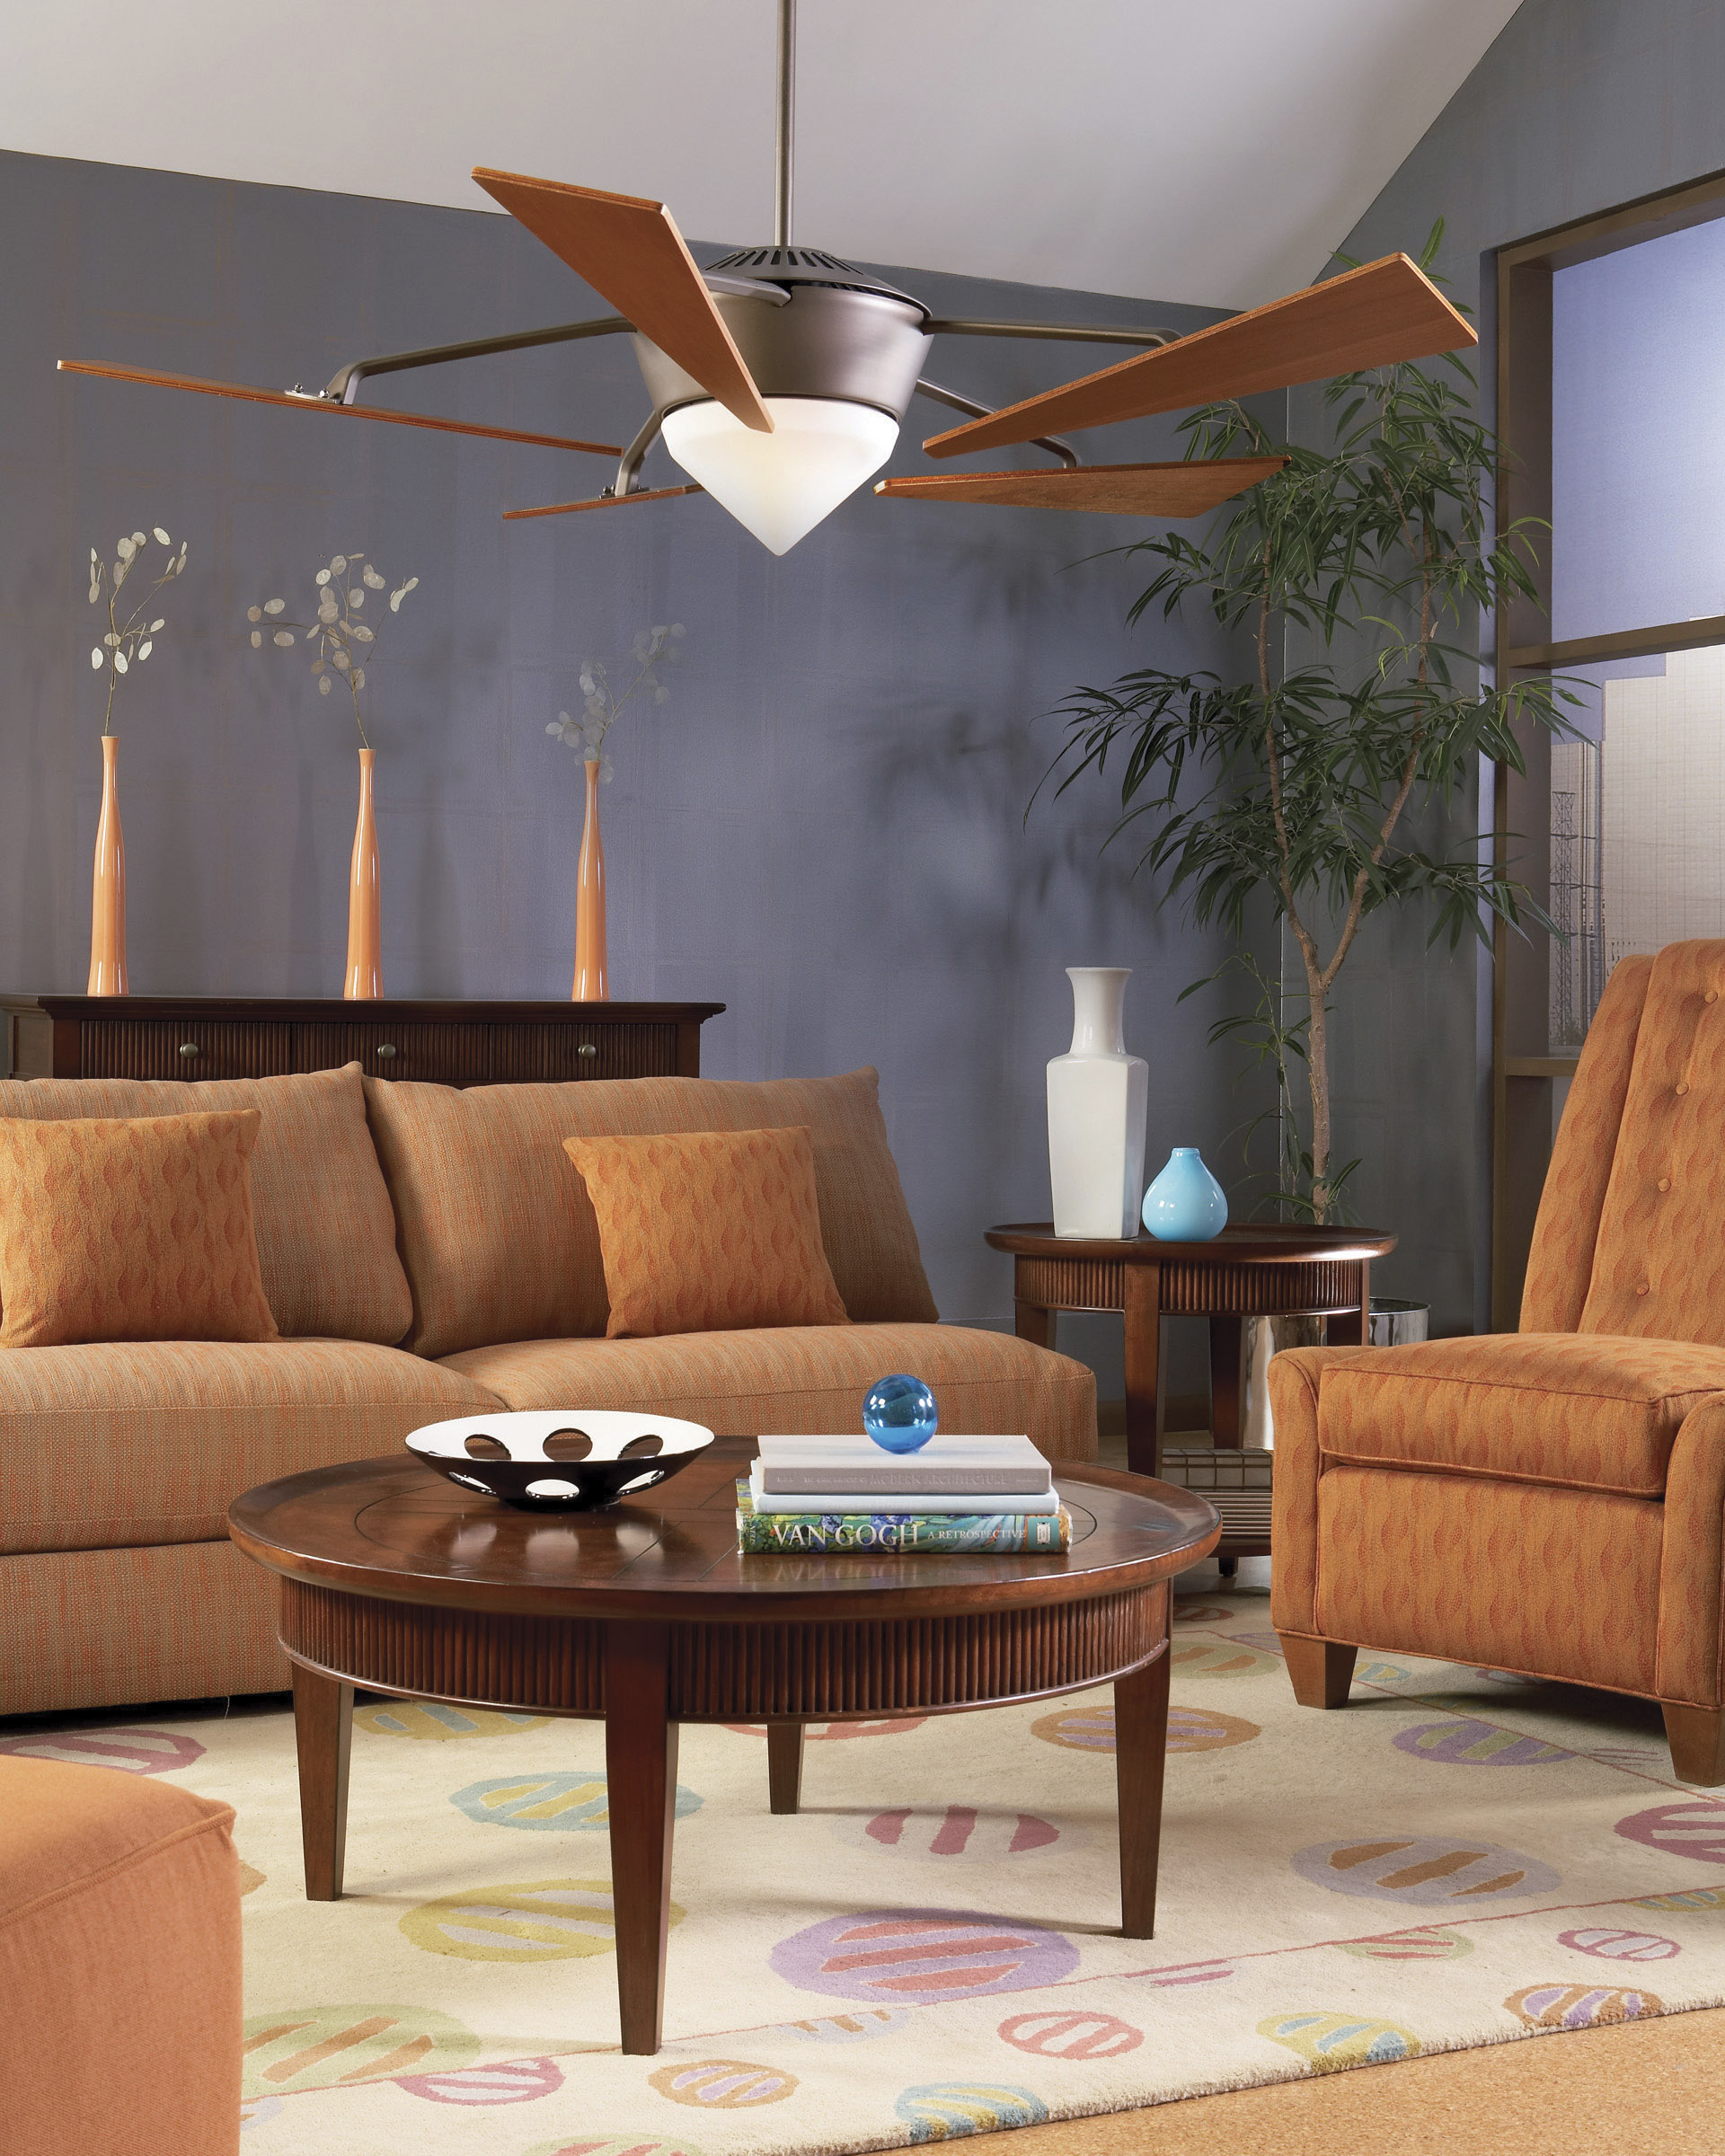 Fanimation Fp4210 220 Volare 60 Inch 220 Volt Ceiling Fan